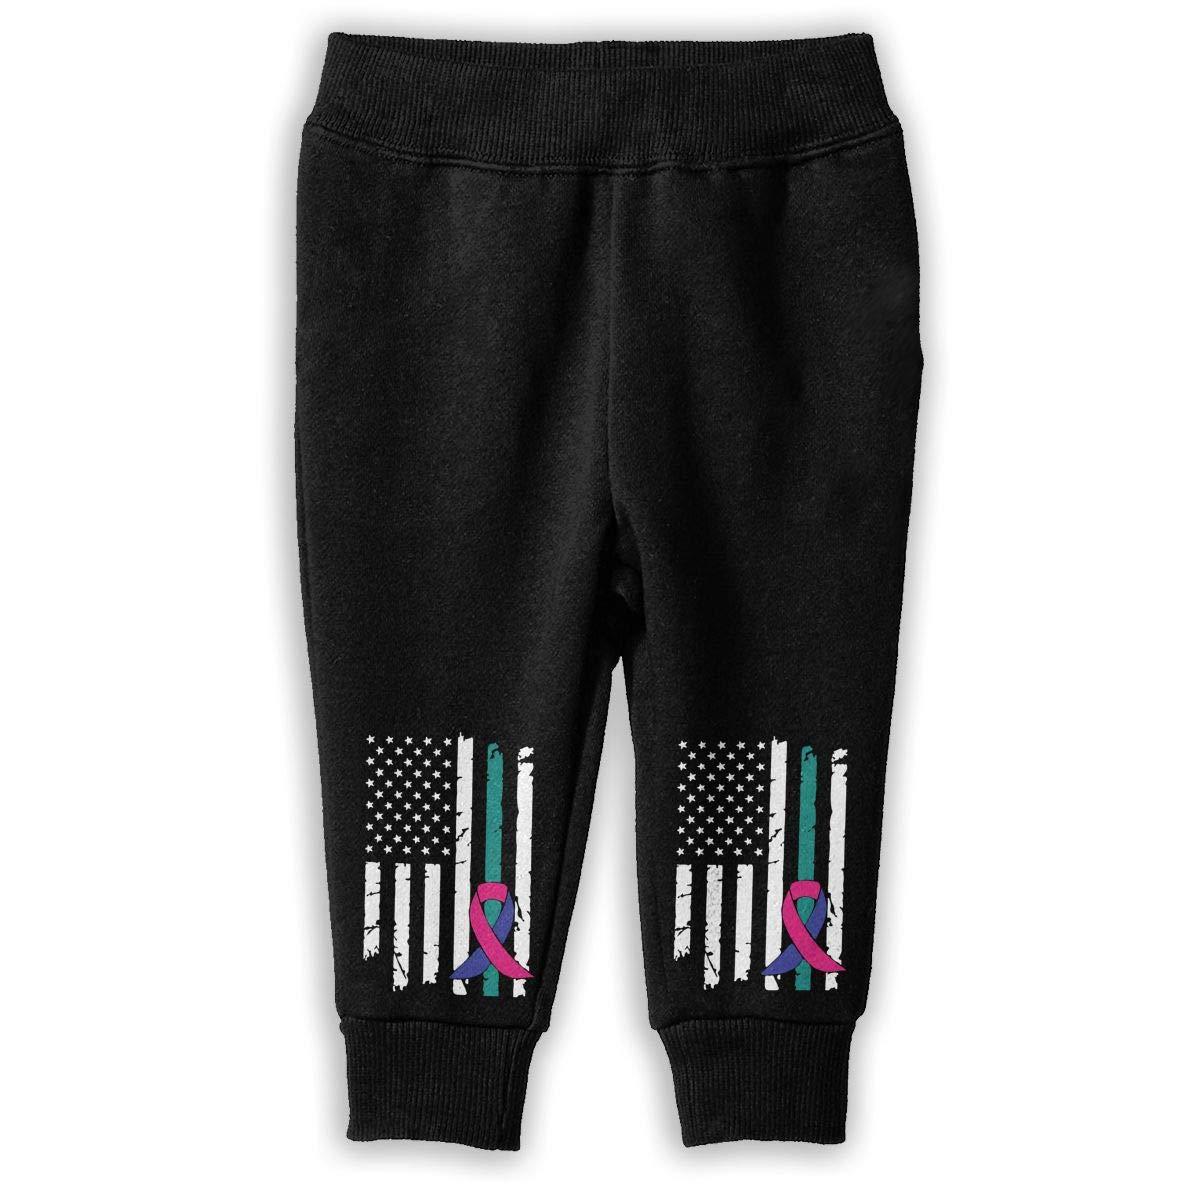 Childrens Sports Pants NJKM5MJ Thyroid Cancer Awareness USA Flag-1 Sweatpants